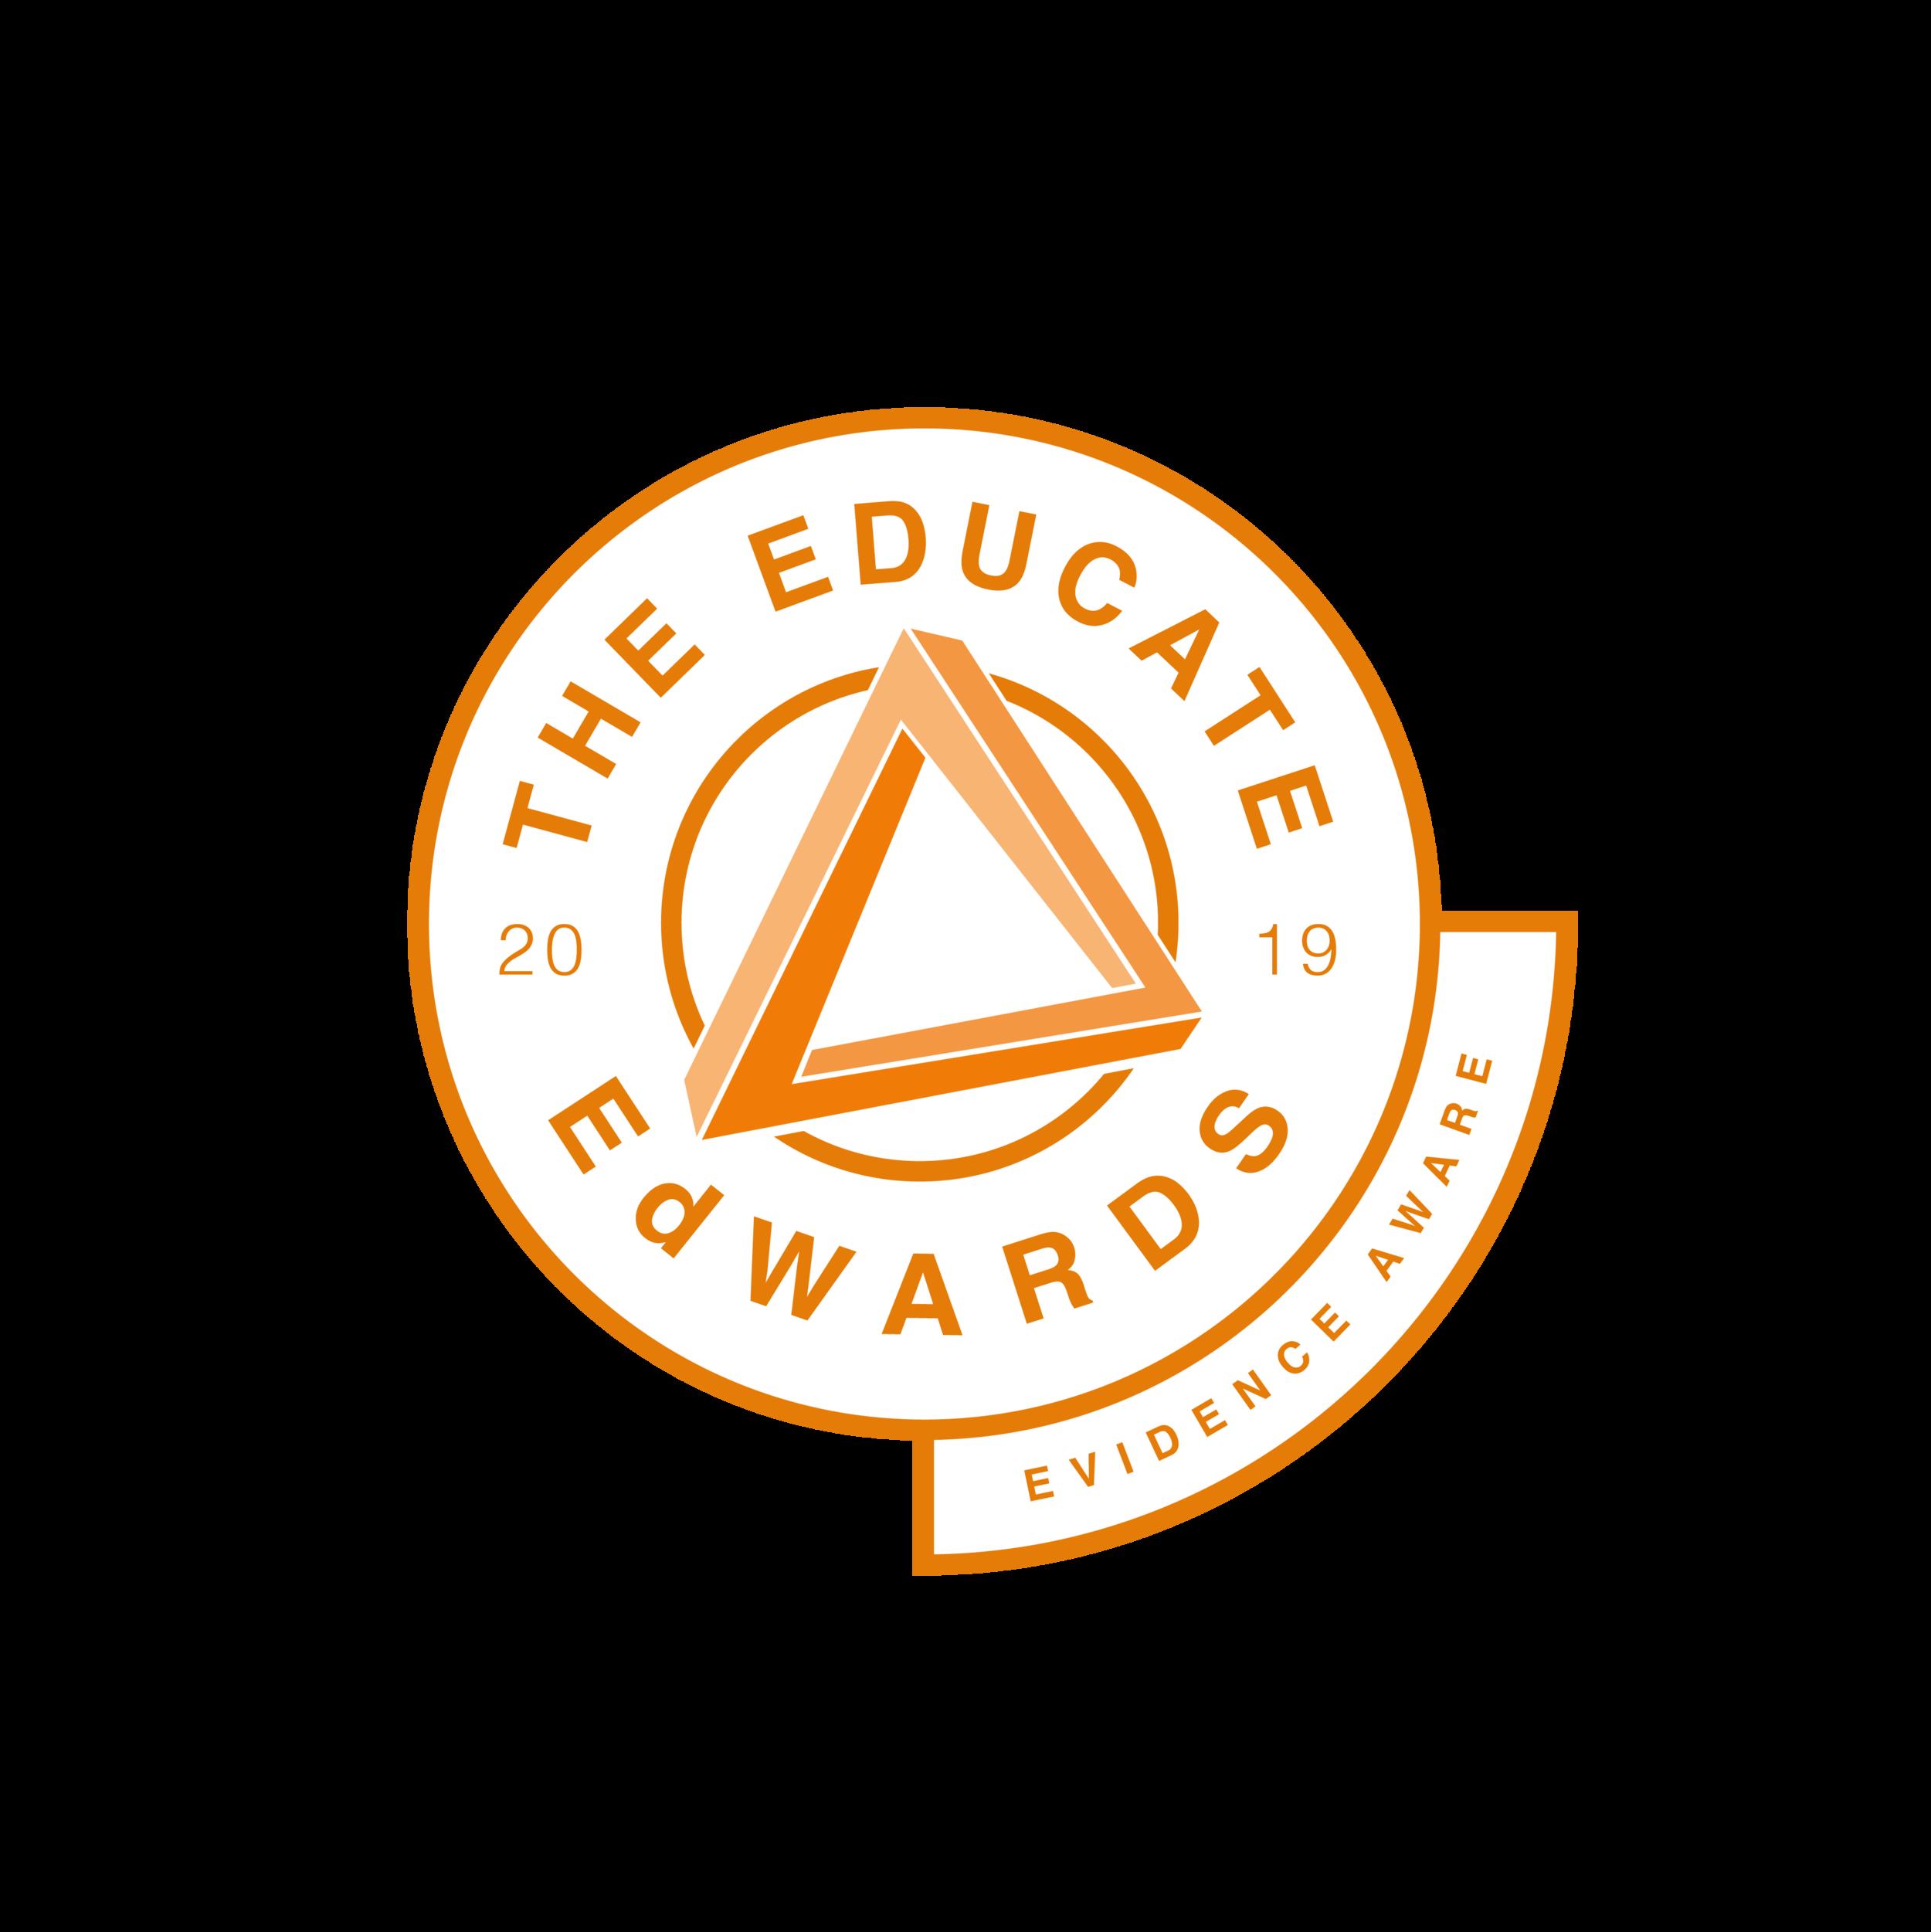 EDWARD_AWARE.png